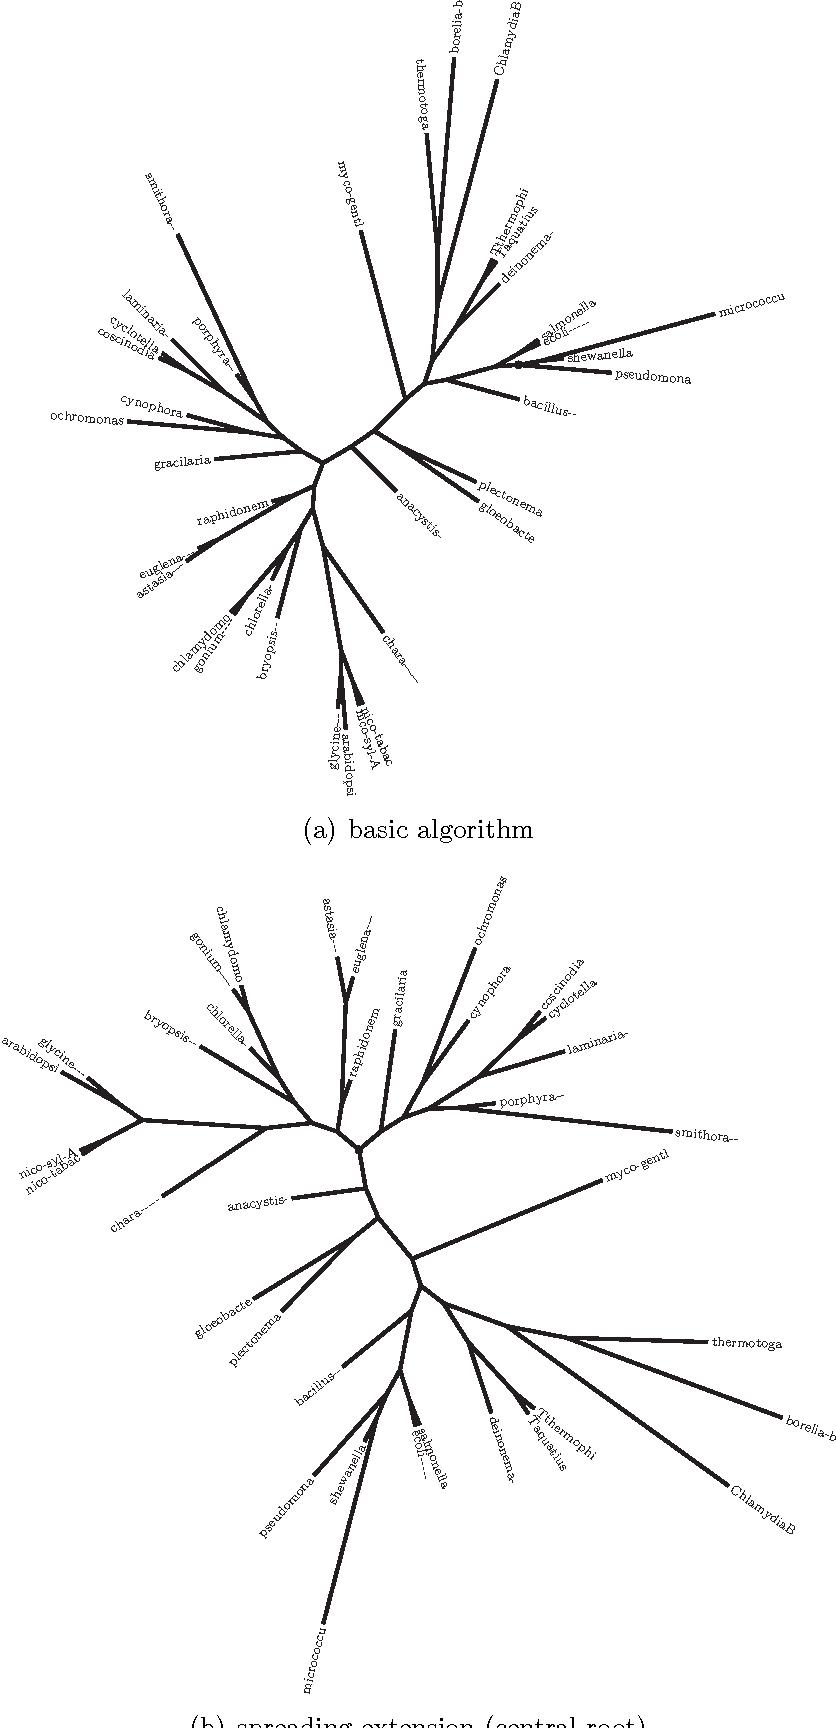 figure 3.8